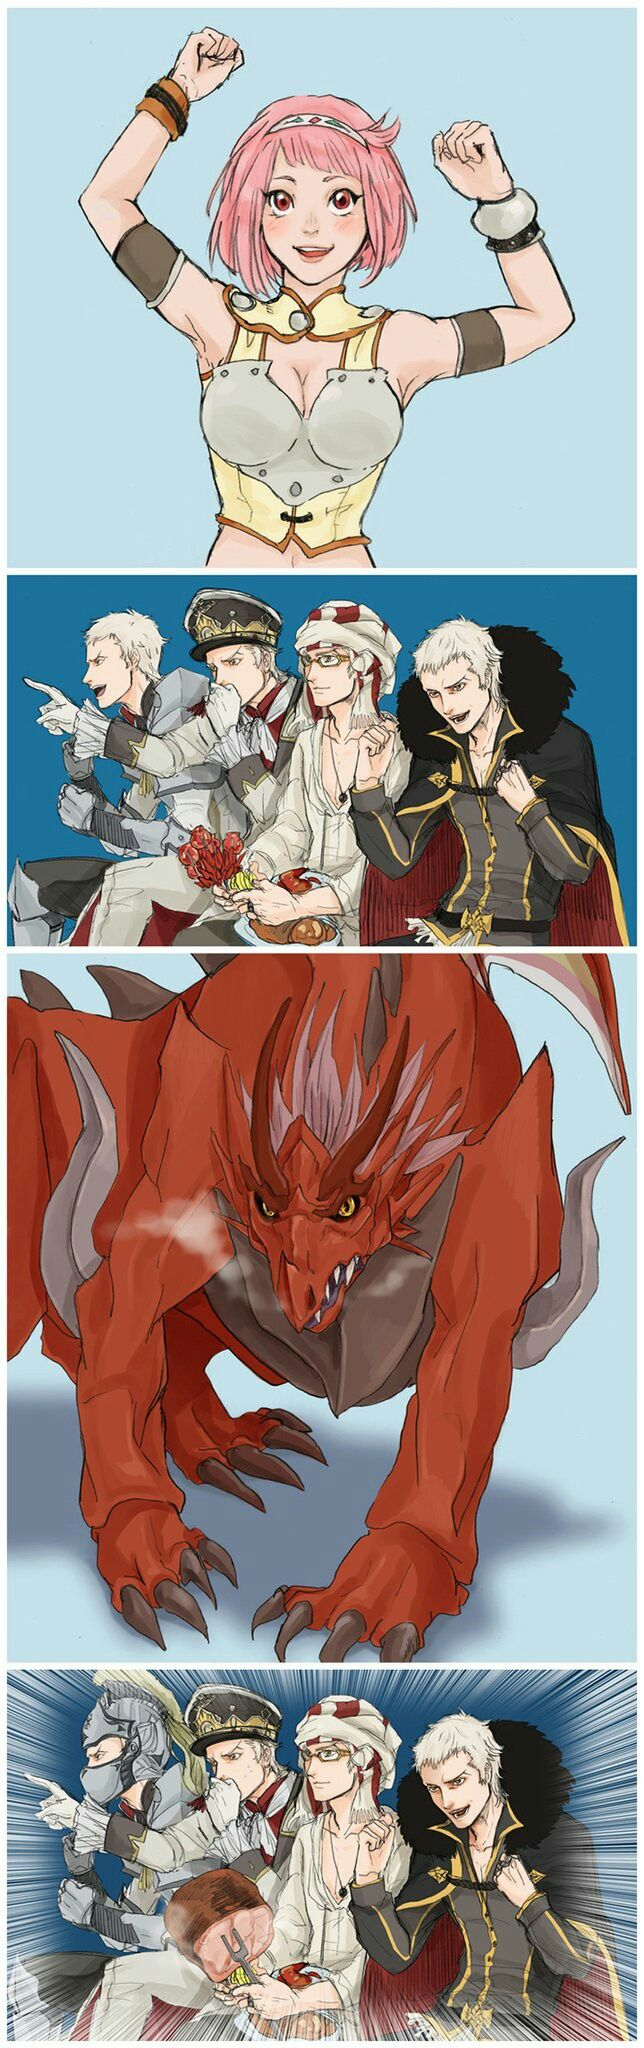 XDDDDD_chris loves nina,human form or dragon form does'nt matter at all.( ´ ▽ ` )